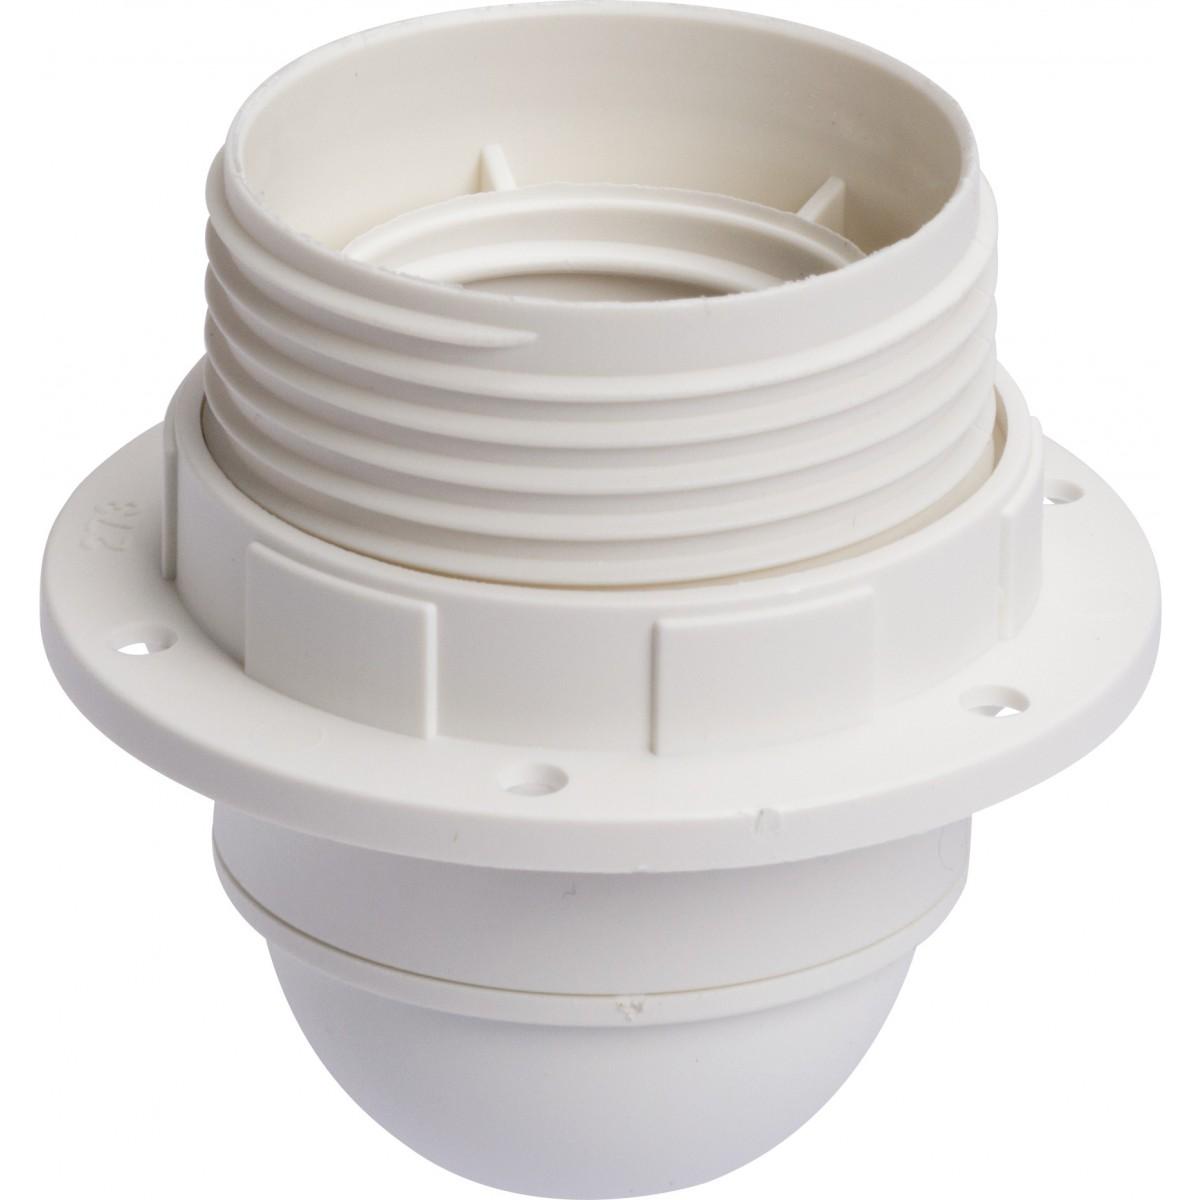 Douille E27 plastique Legrand - Raccord diamètre 10 mm - Bague isolante